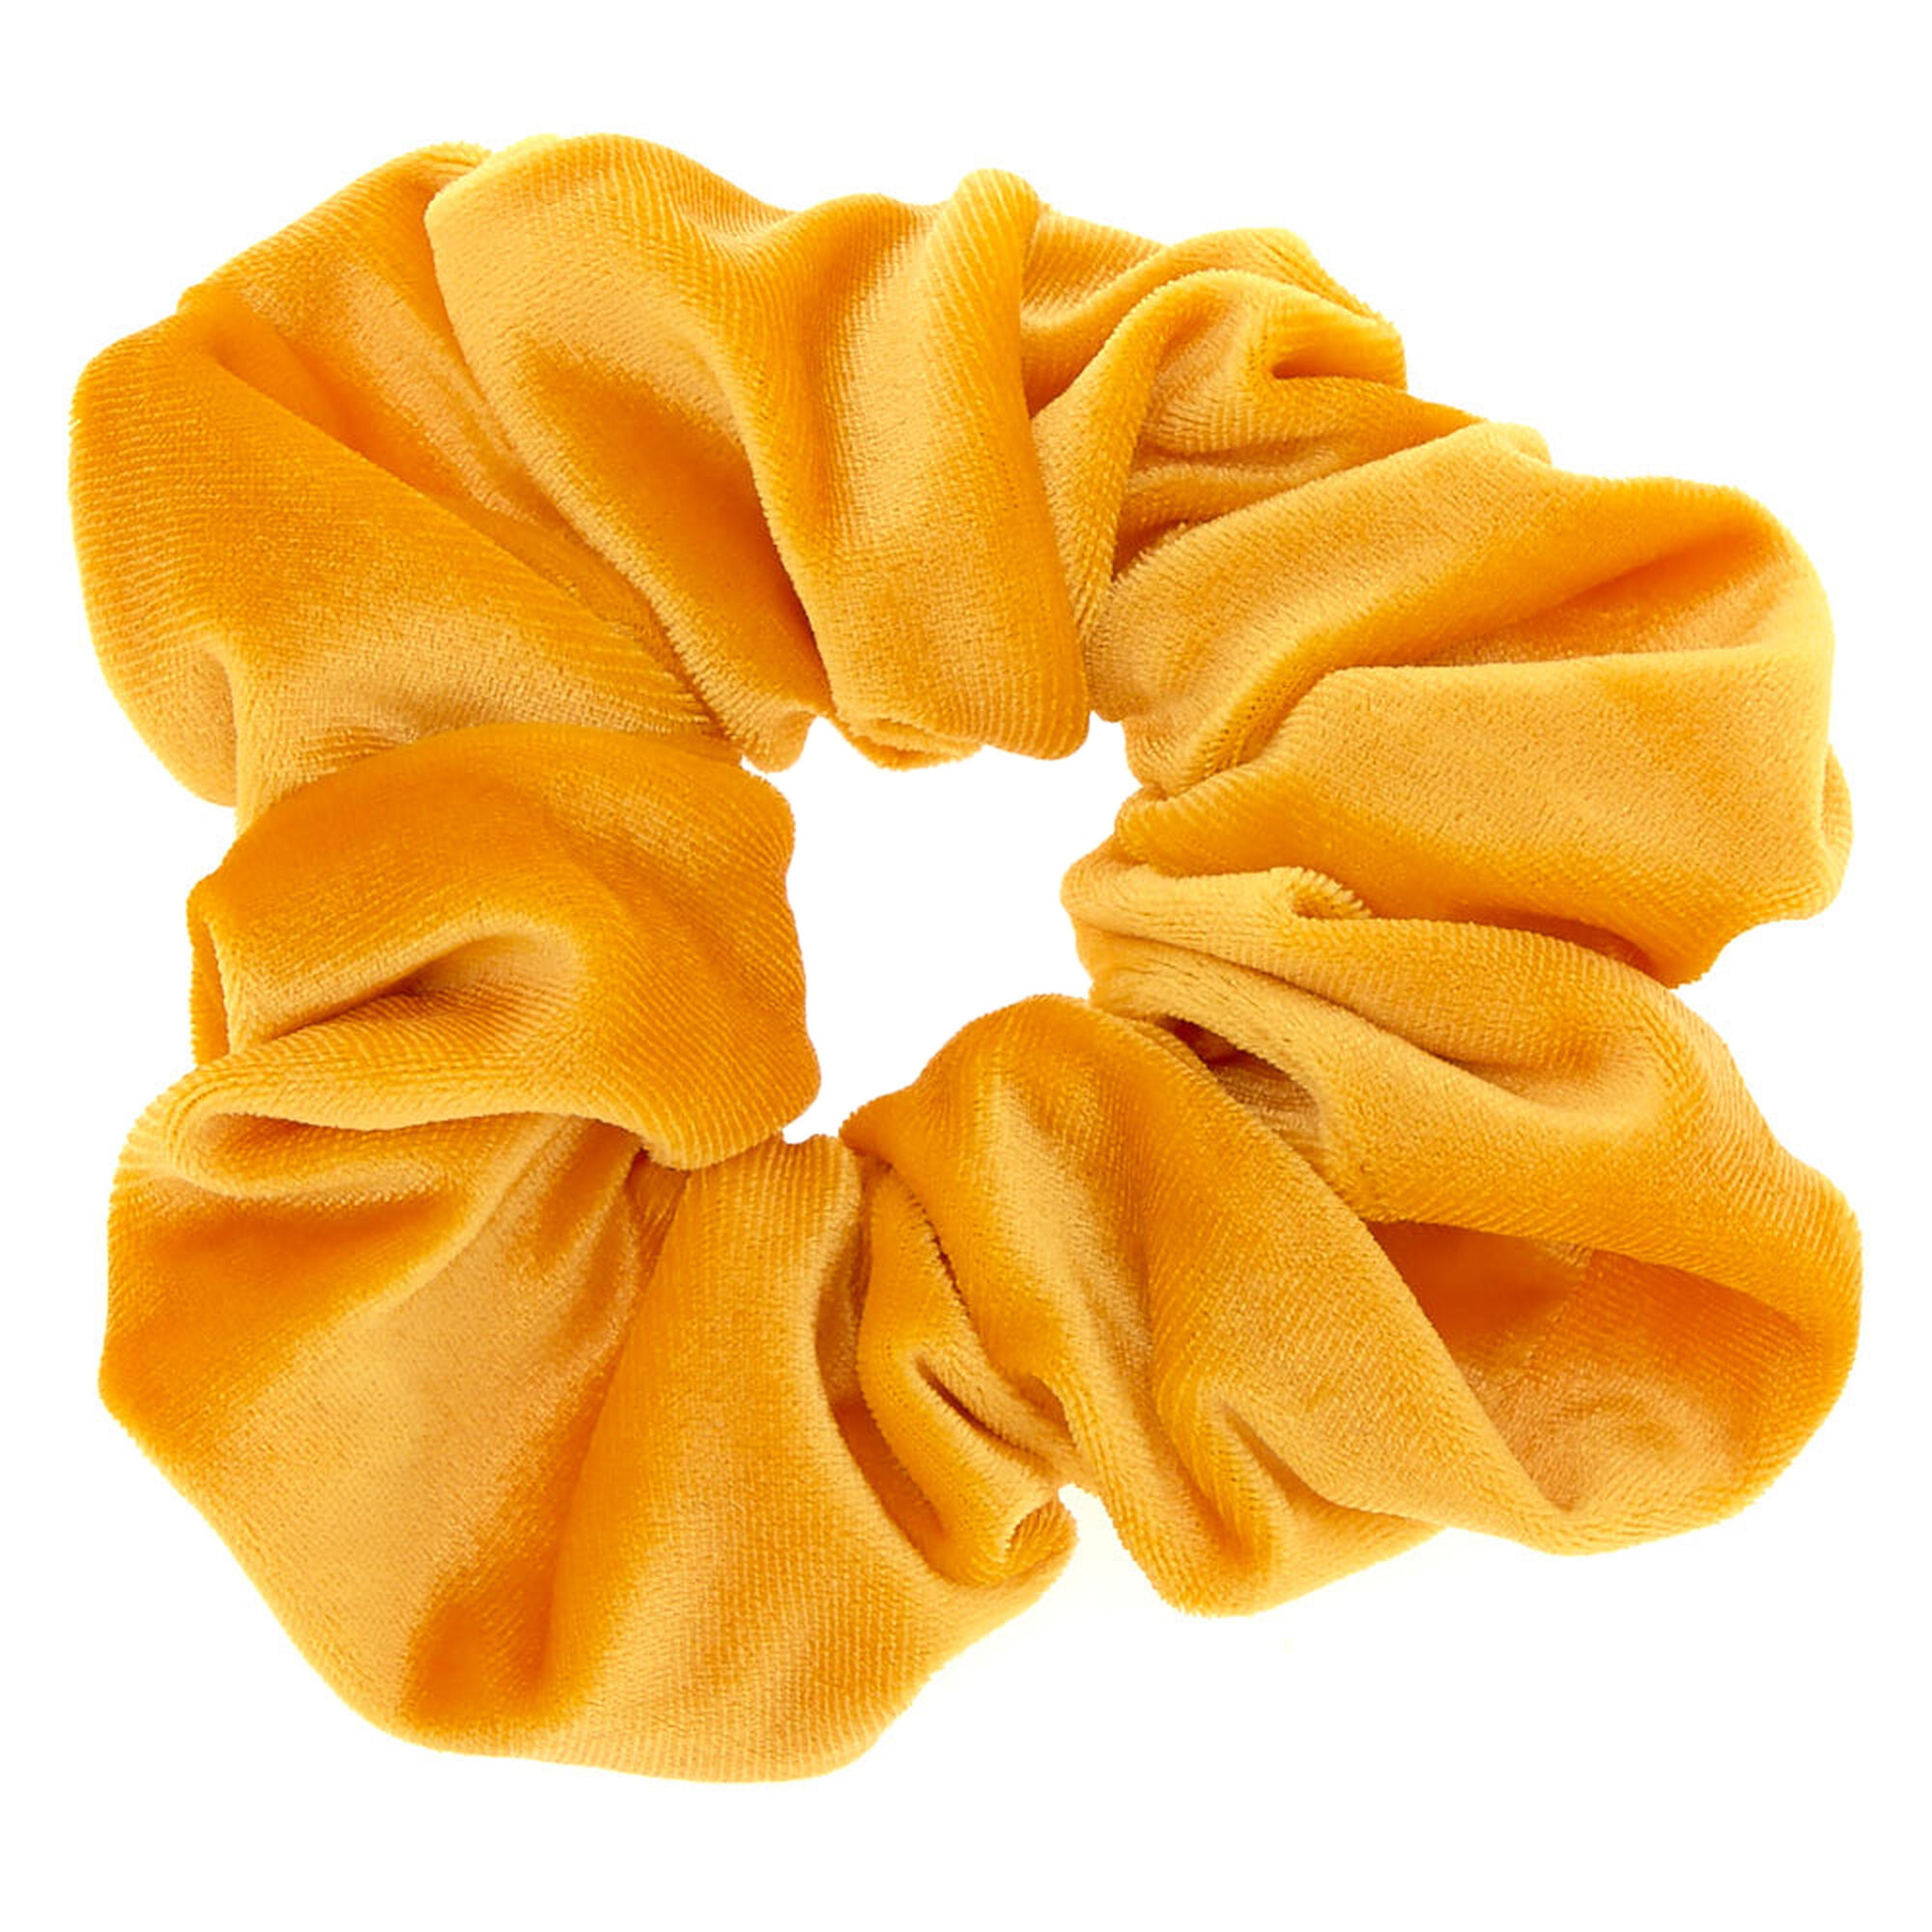 Oversized Velvet Hair Scrunchie - Mustard Yellow   Icing US